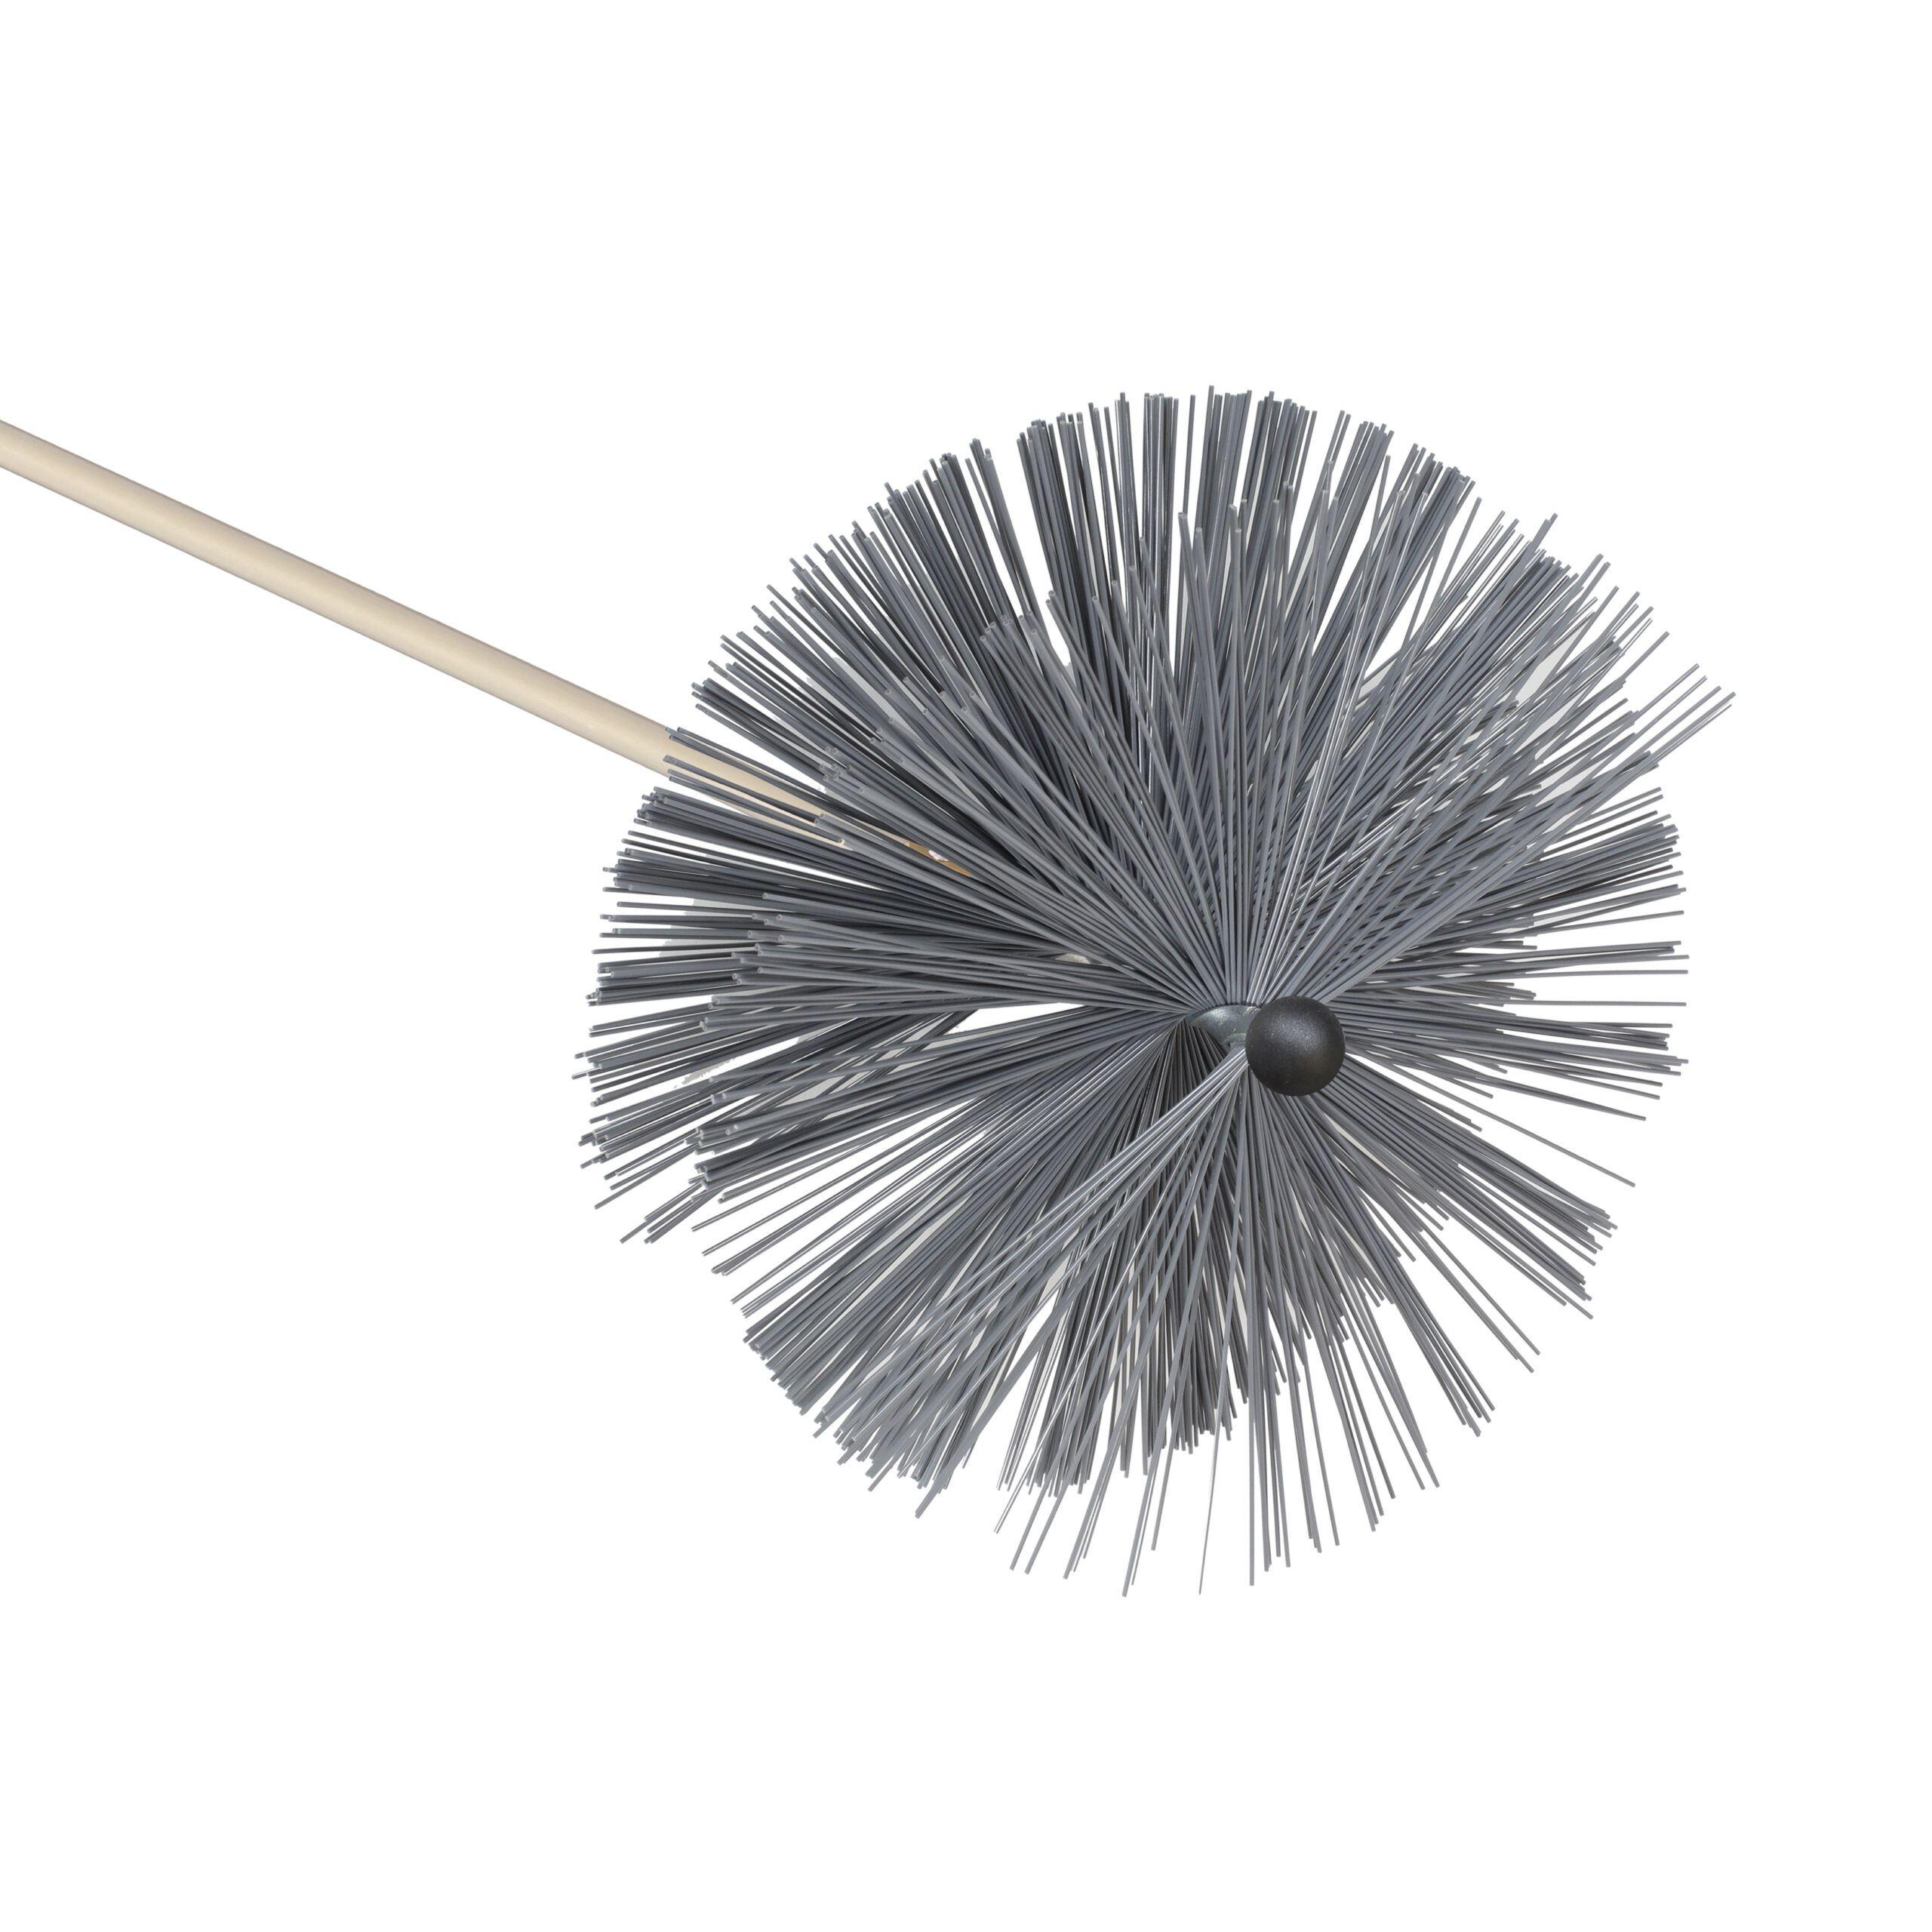 12″ Hard Bristle Chimney Brush